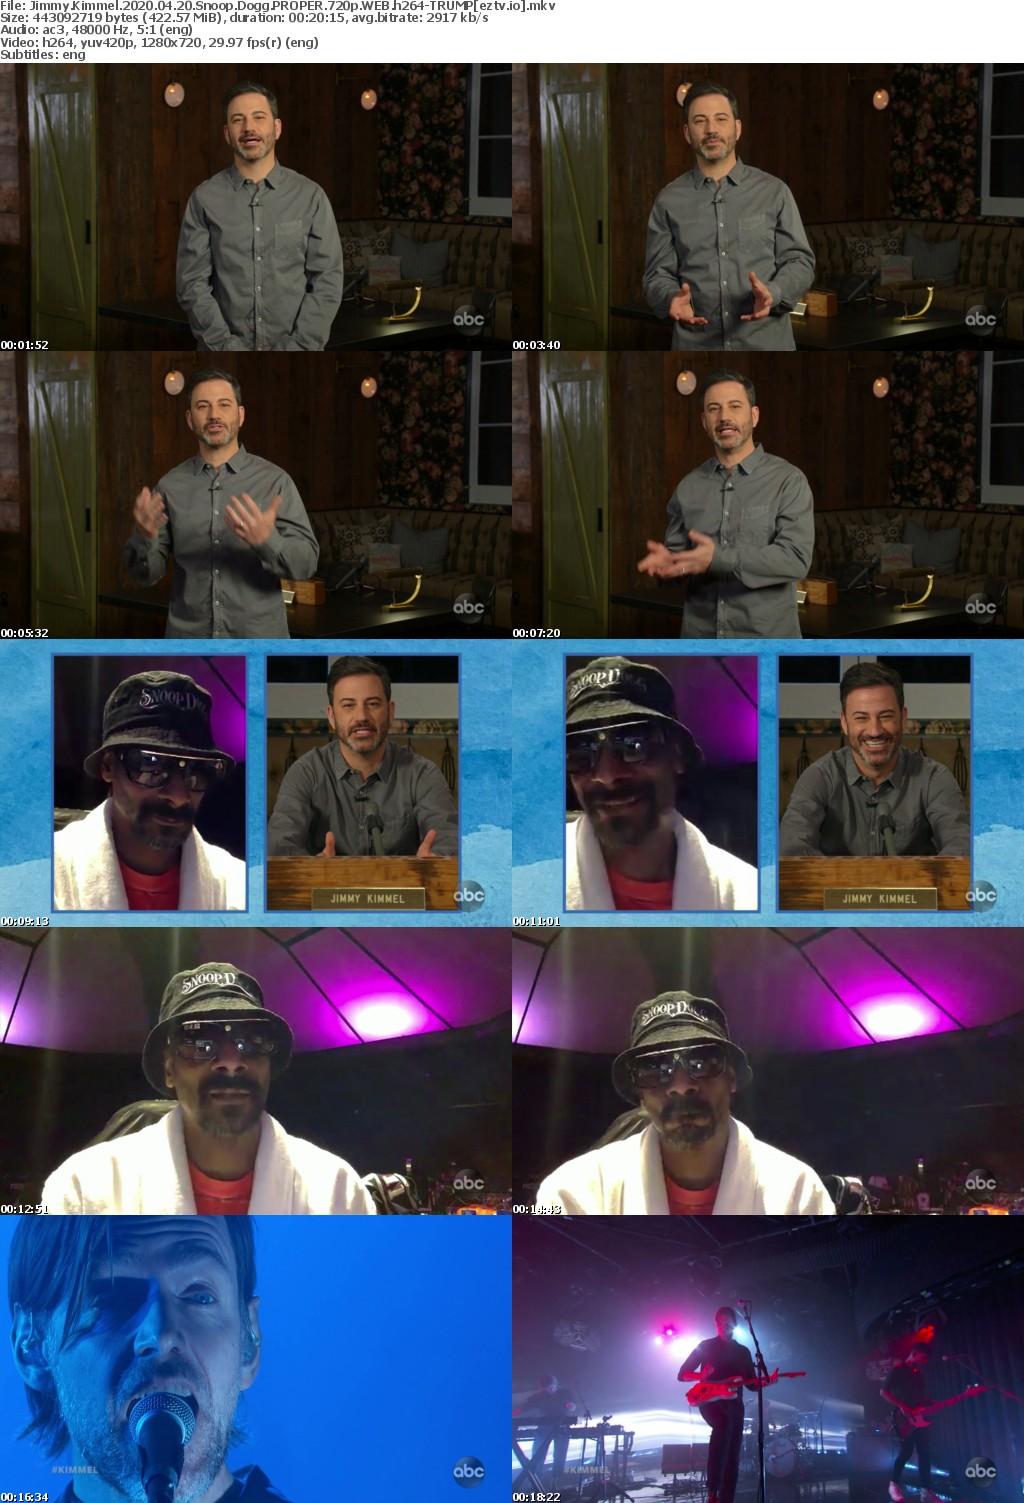 Jimmy Kimmel 2020 04 20 Snoop Dogg PROPER 720p WEB h264-TRUMP